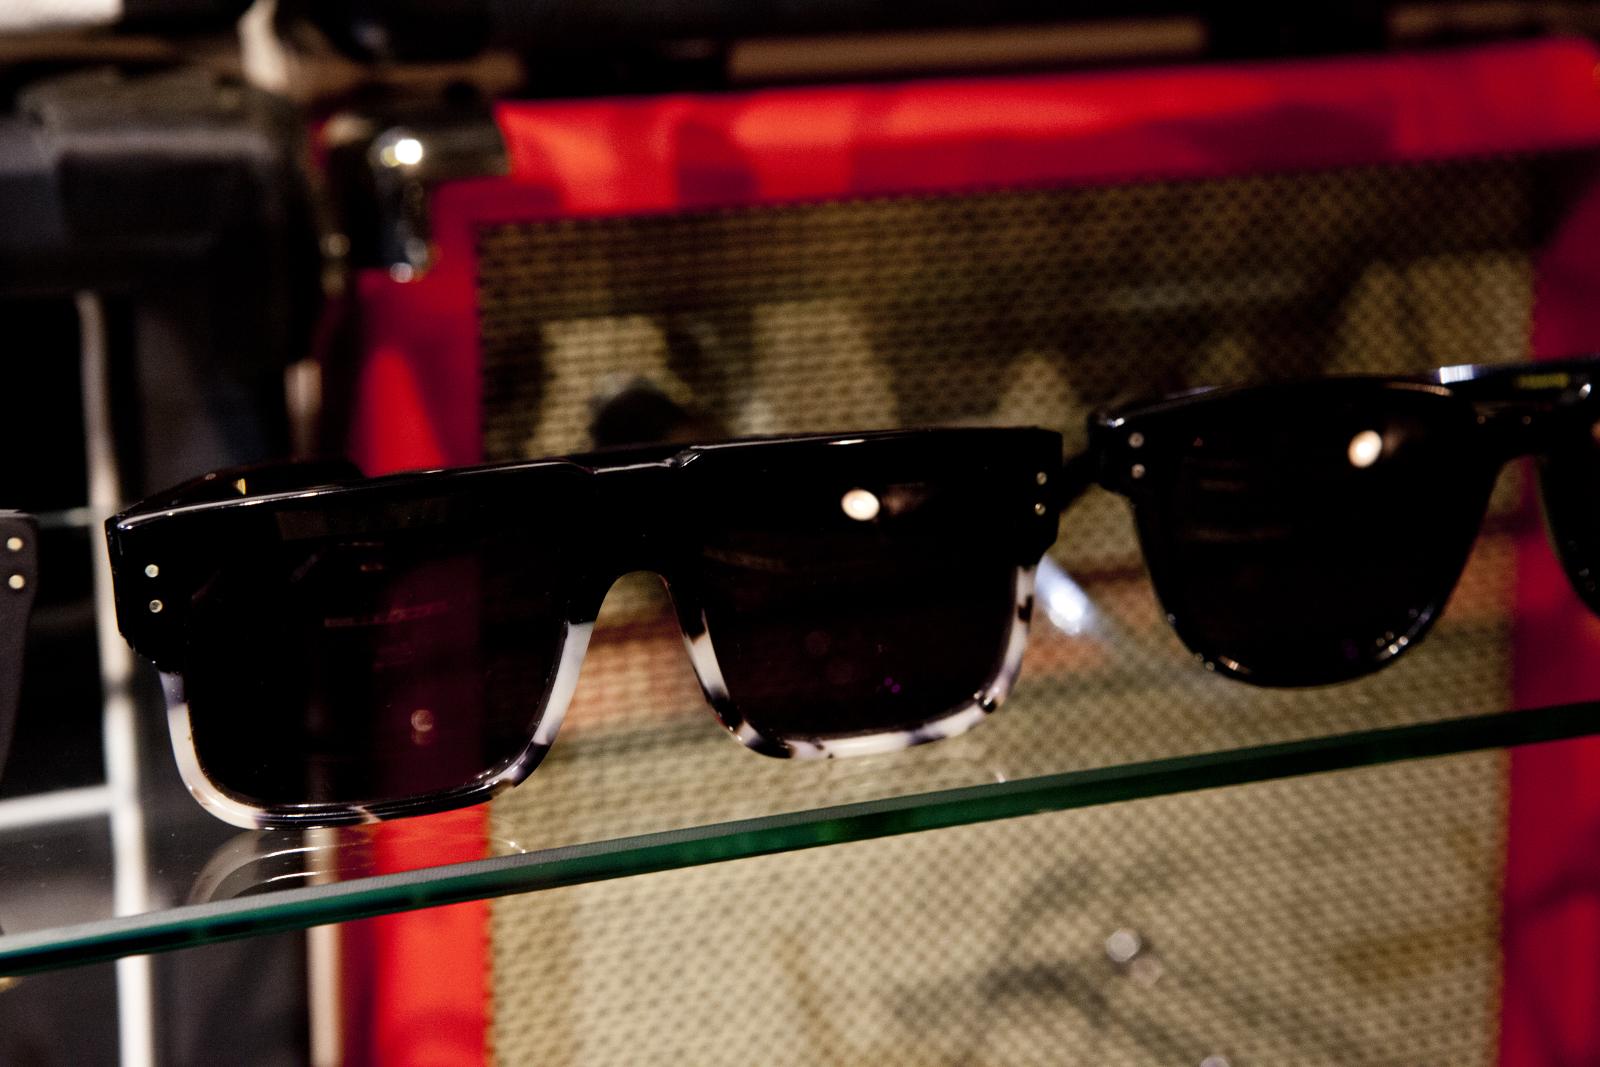 Robert_Adalierd_Rob_Design_Furniture_Wilde_sunglasses2.jpg